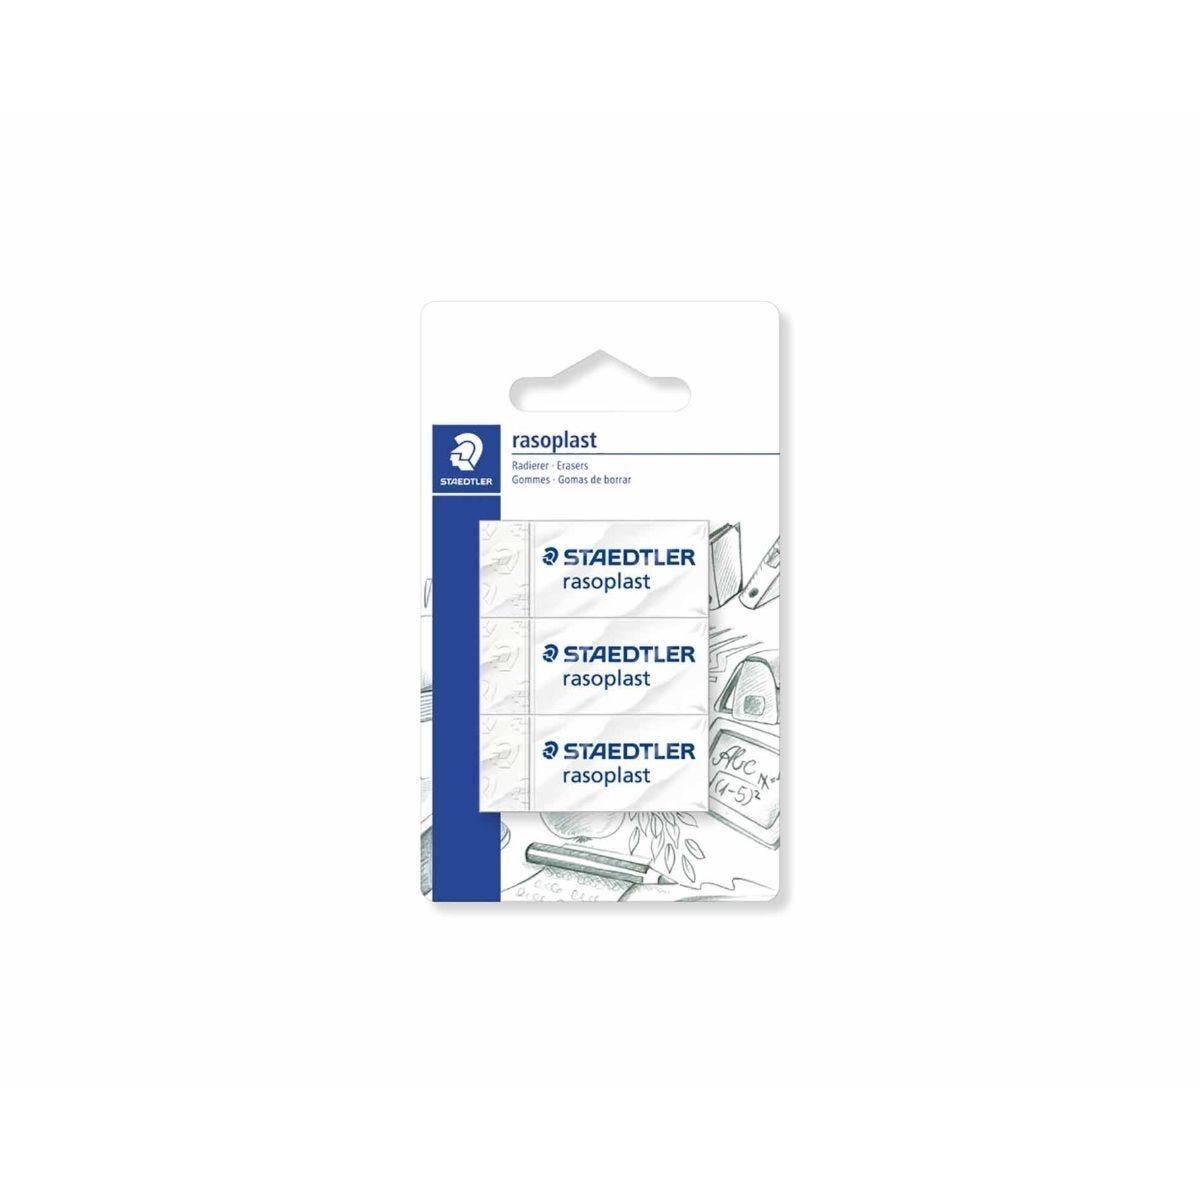 Staedtler Rasoplast Erasers Pack of 3